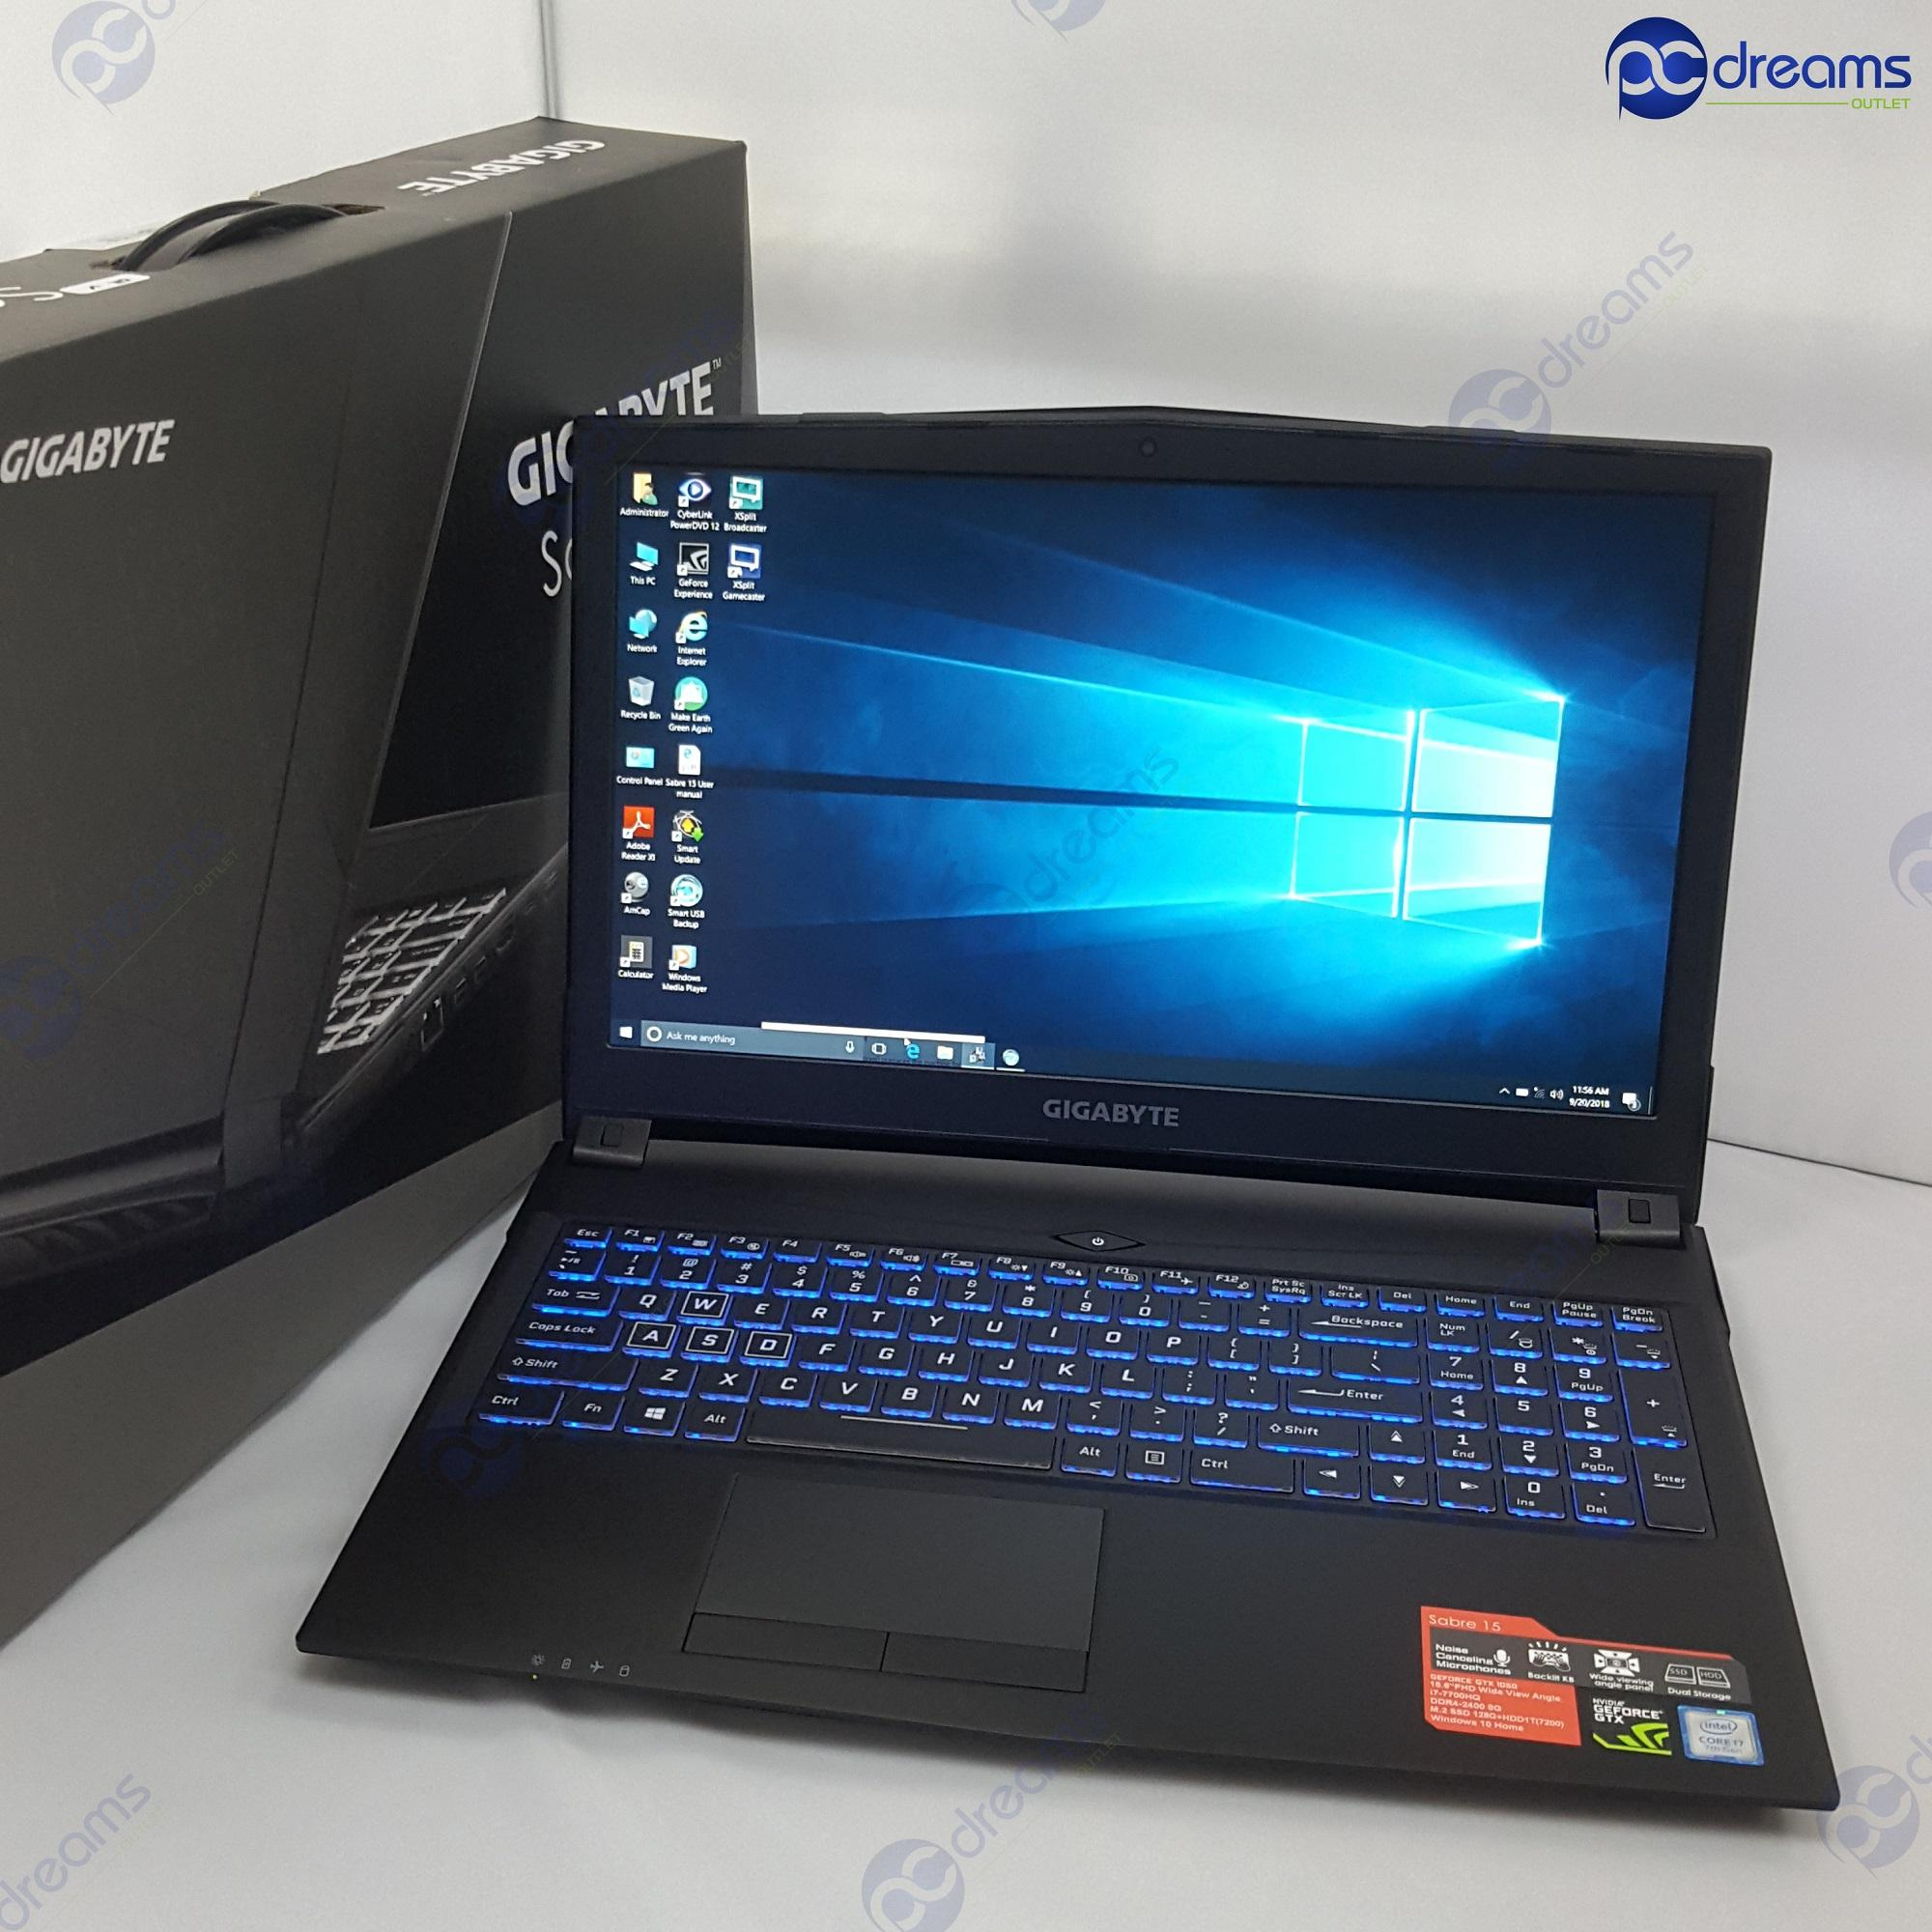 BEST LOBANG! GIGABYTE P45G i7-7700HQ/8GB/12GB SSD + 1TB HDD/GTX1050 [Brand New]